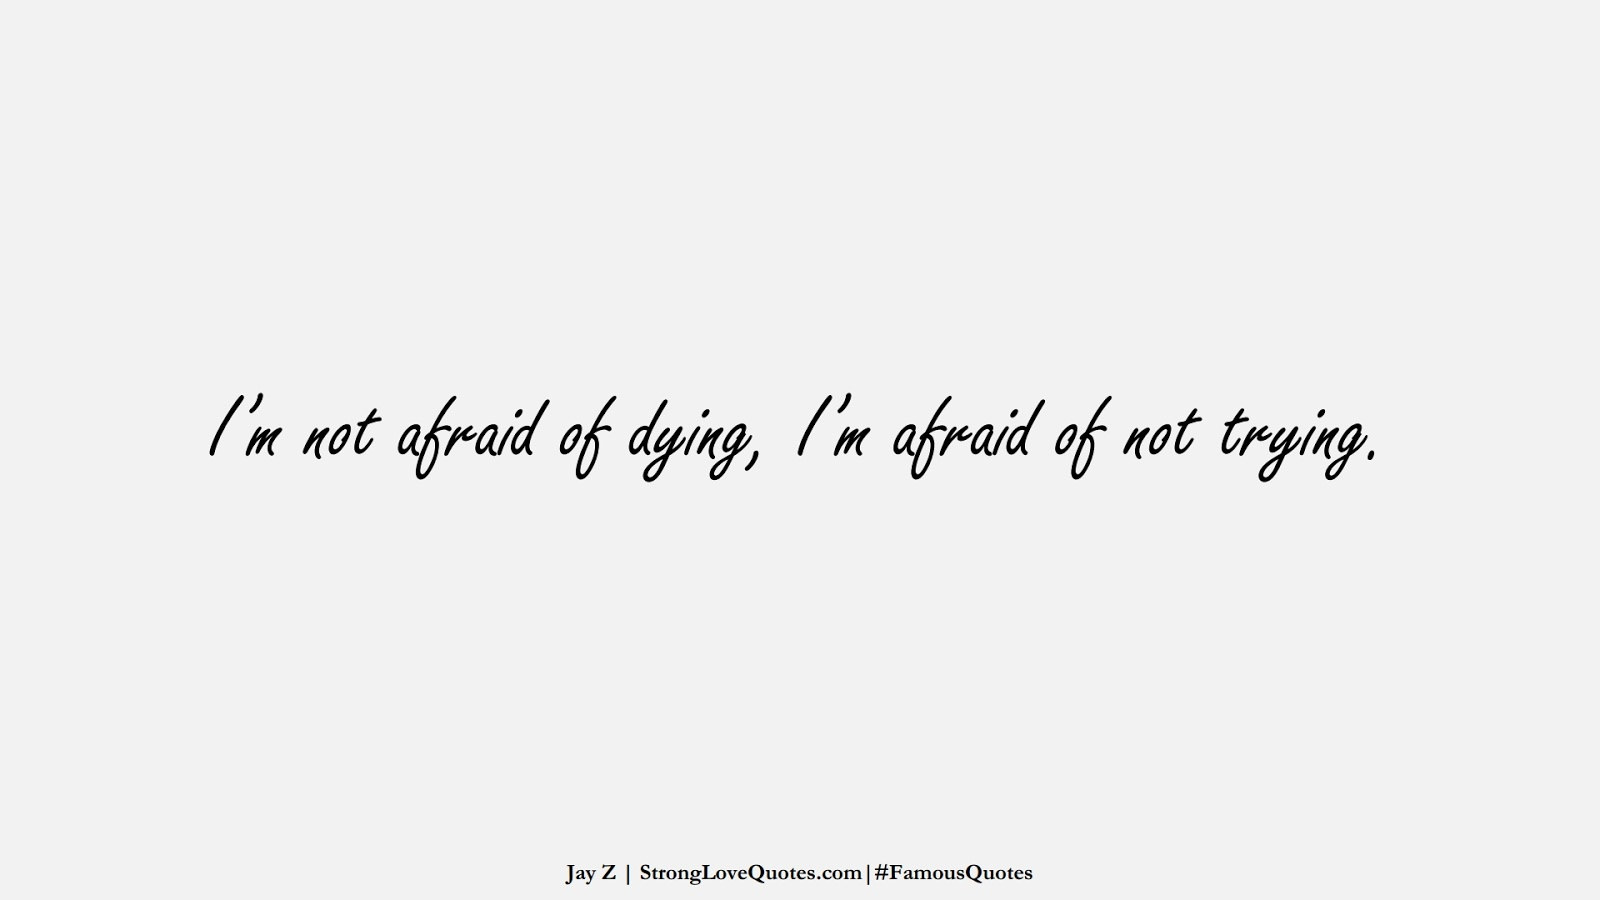 I'm not afraid of dying, I'm afraid of not trying. (Jay Z);  #FamousQuotes